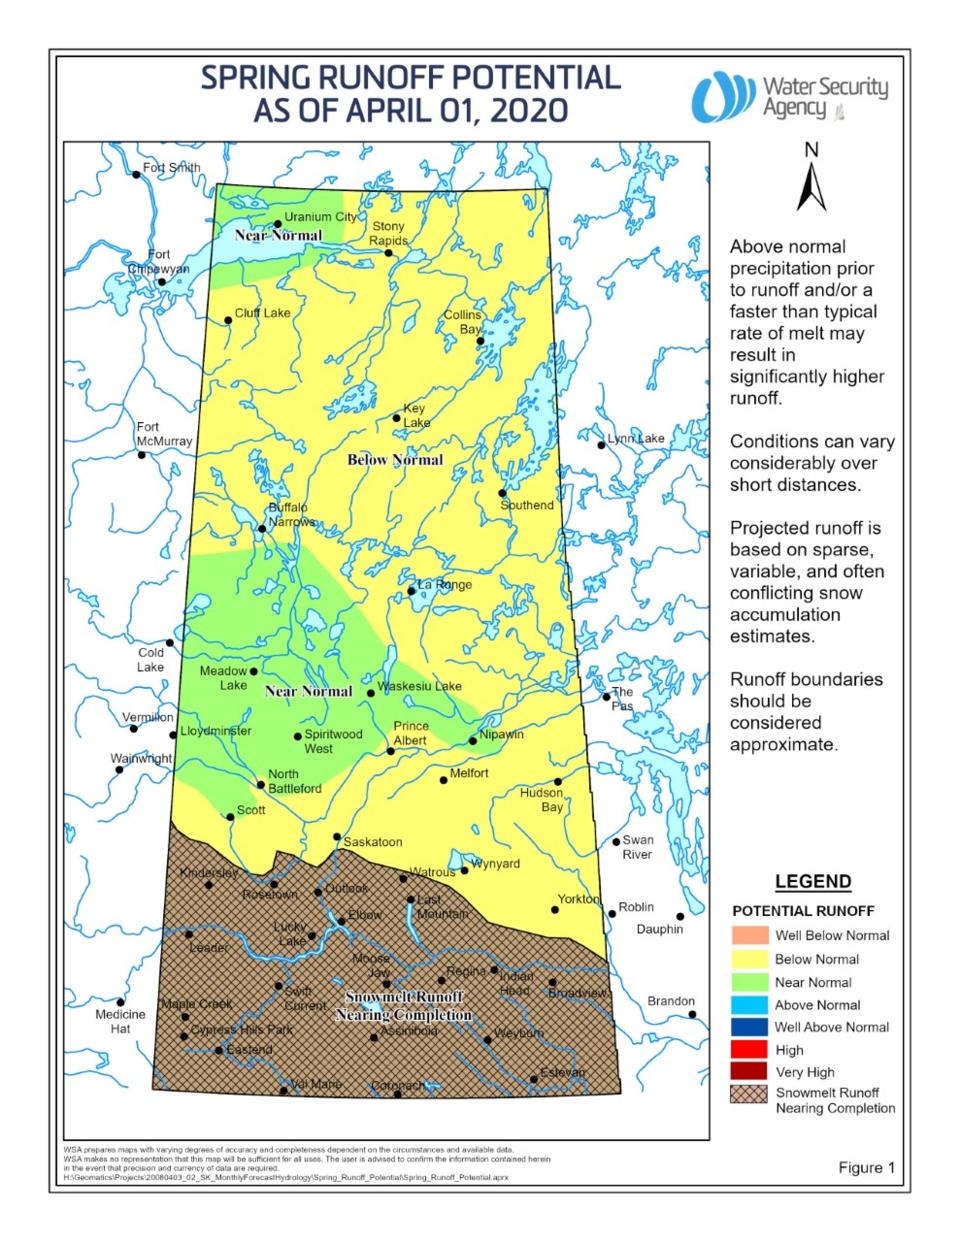 wsa spring runoff map april 2020